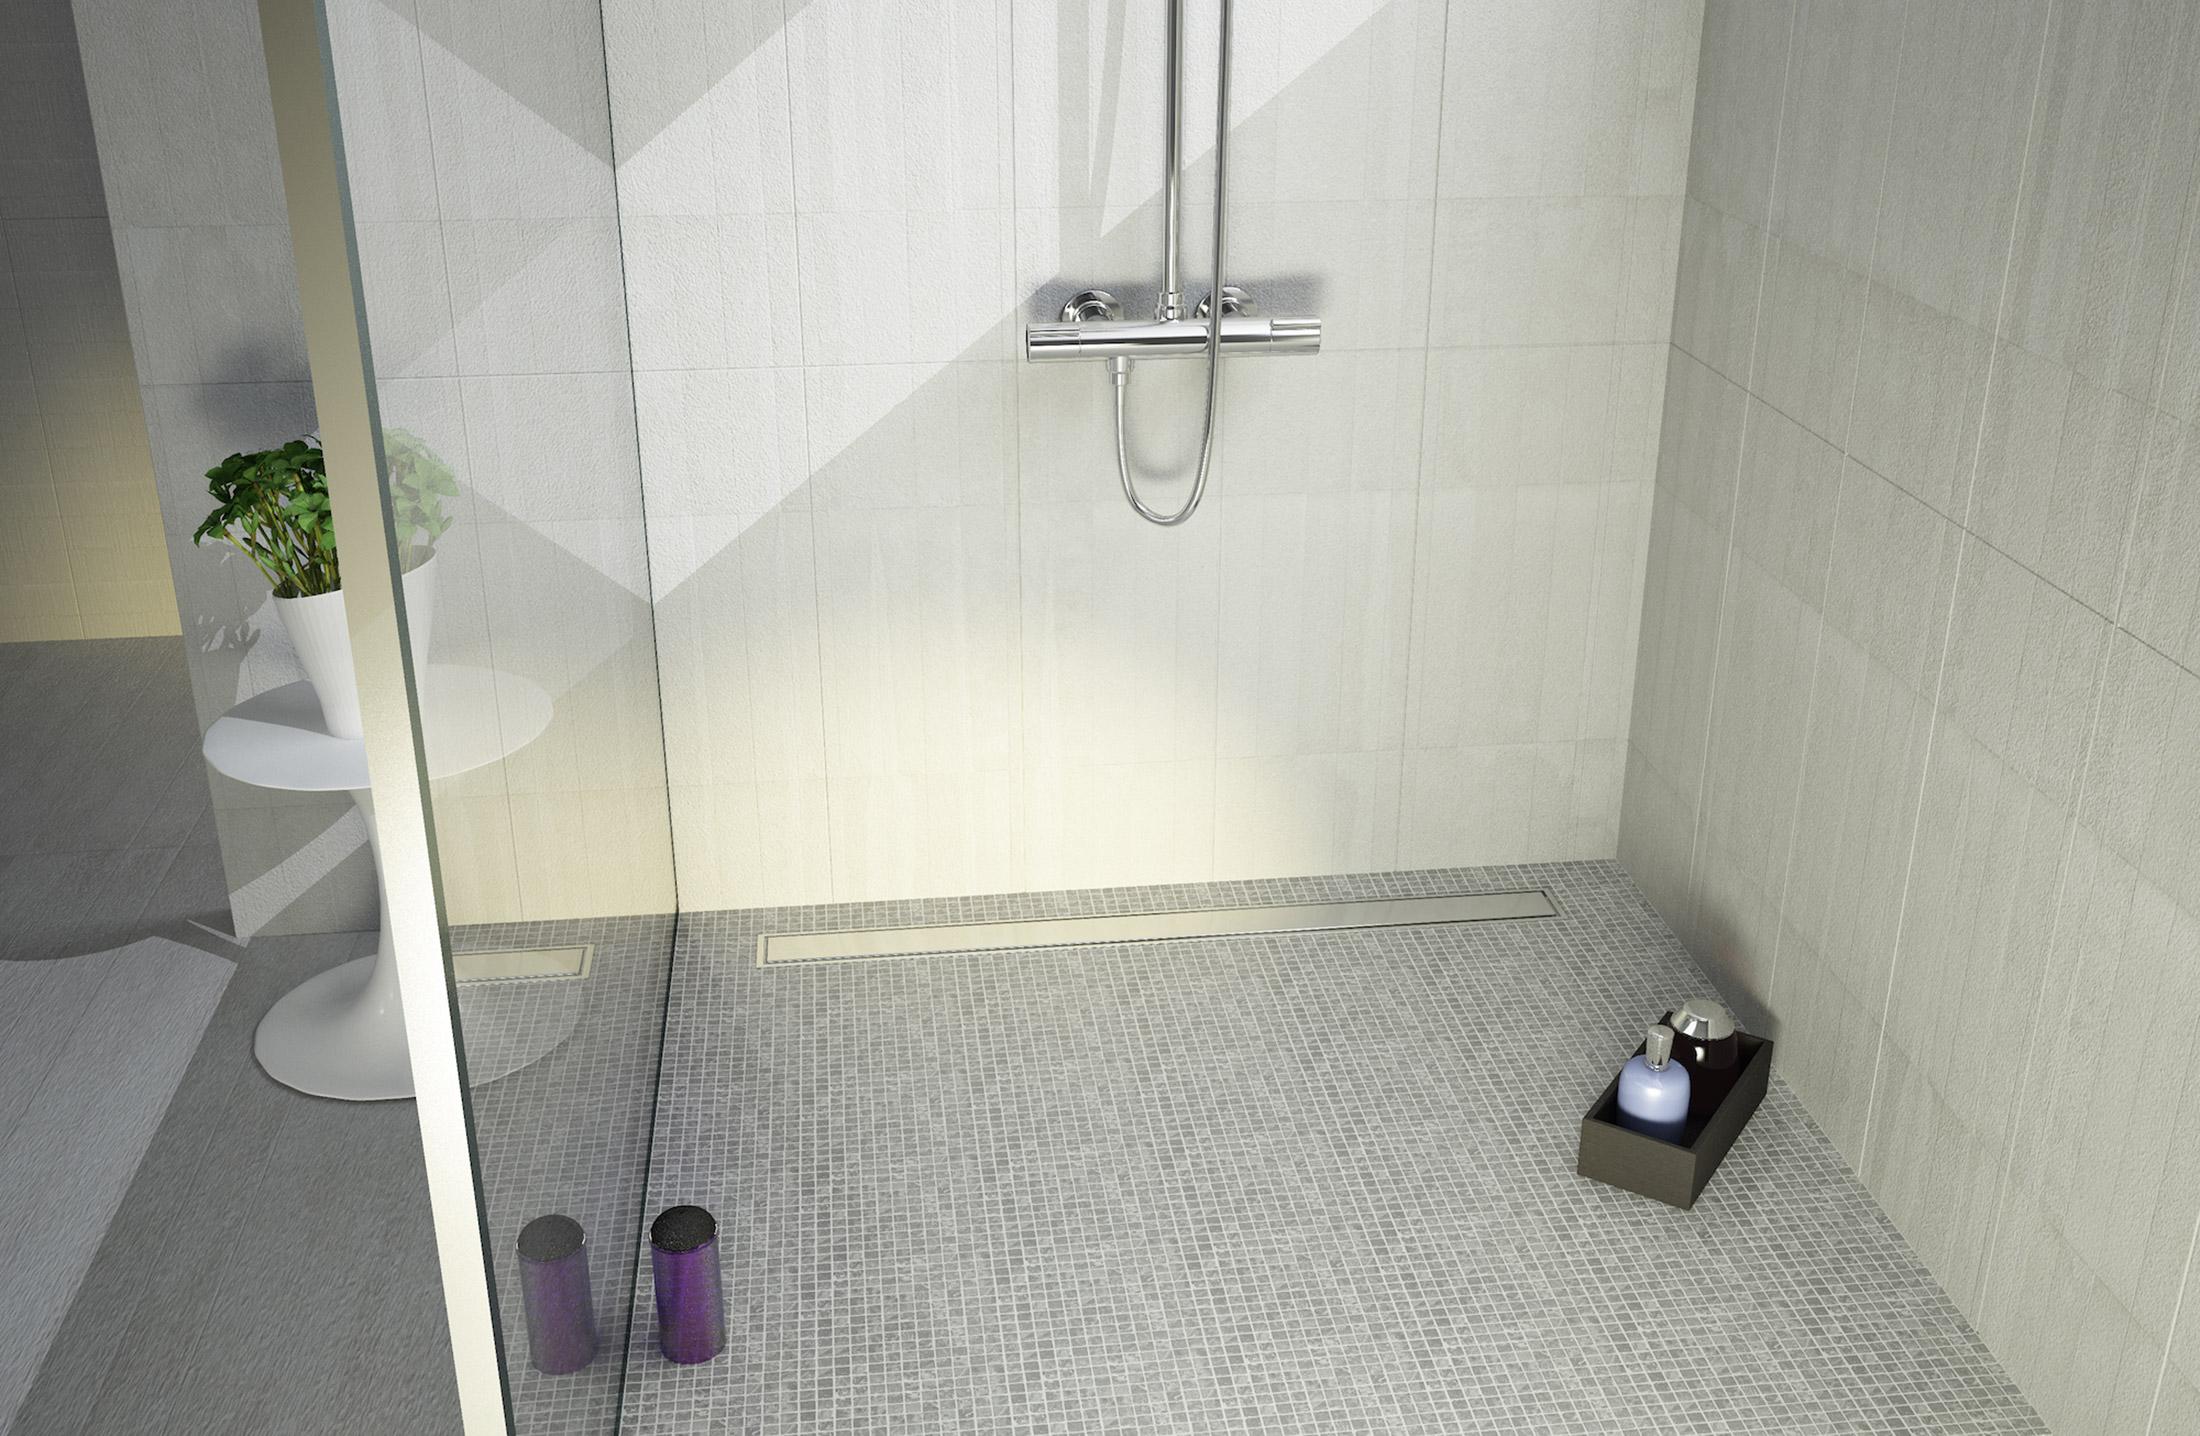 ceramique internationale launches new linear drain wet. Black Bedroom Furniture Sets. Home Design Ideas